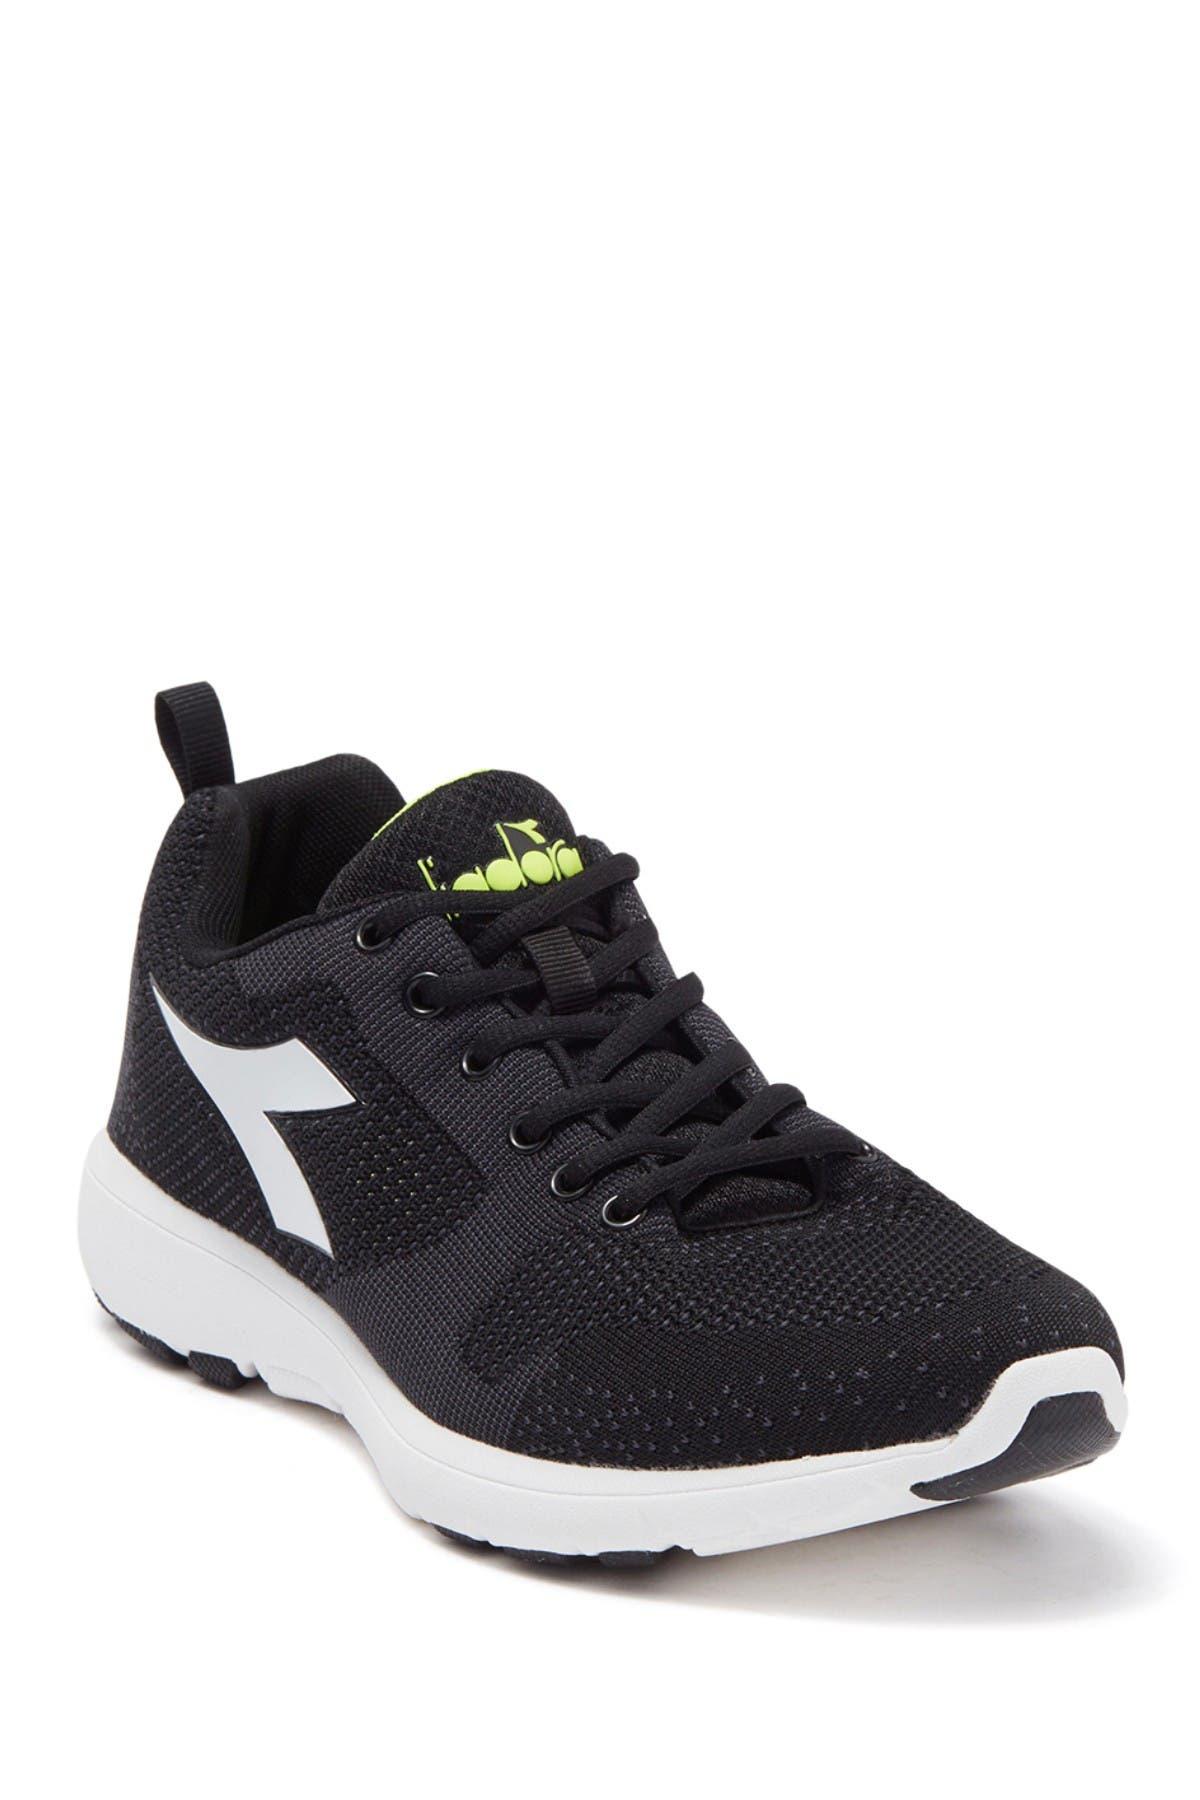 Image of Diadora X-Run Light Sneaker